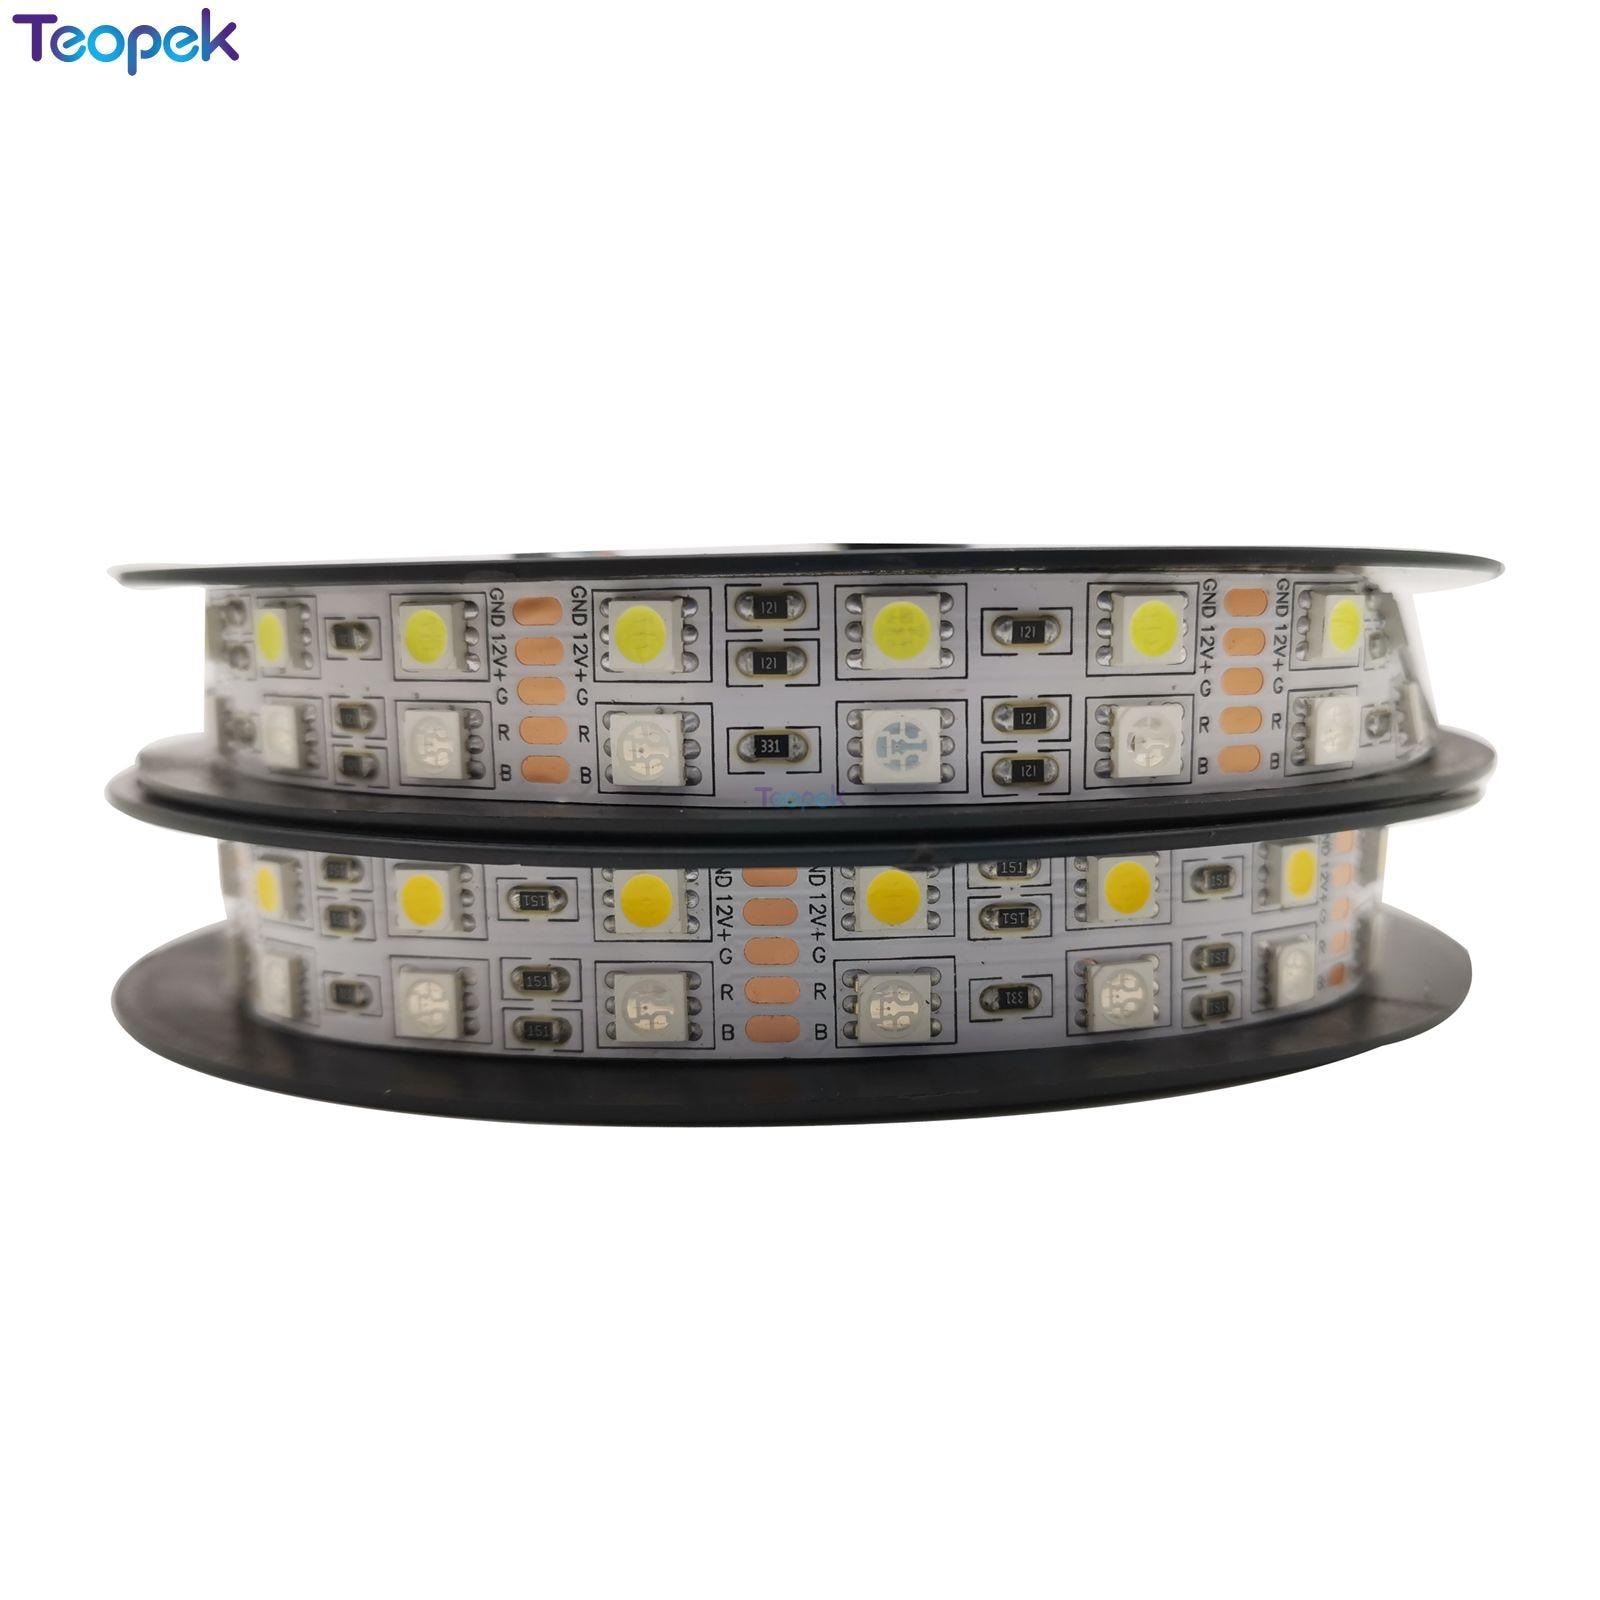 Double Row 5050 RGBW RGBWW RGB+Cool White Warm White Flexible LED Strips DC12V 24V 5M/roll 120led/M 600LEDs